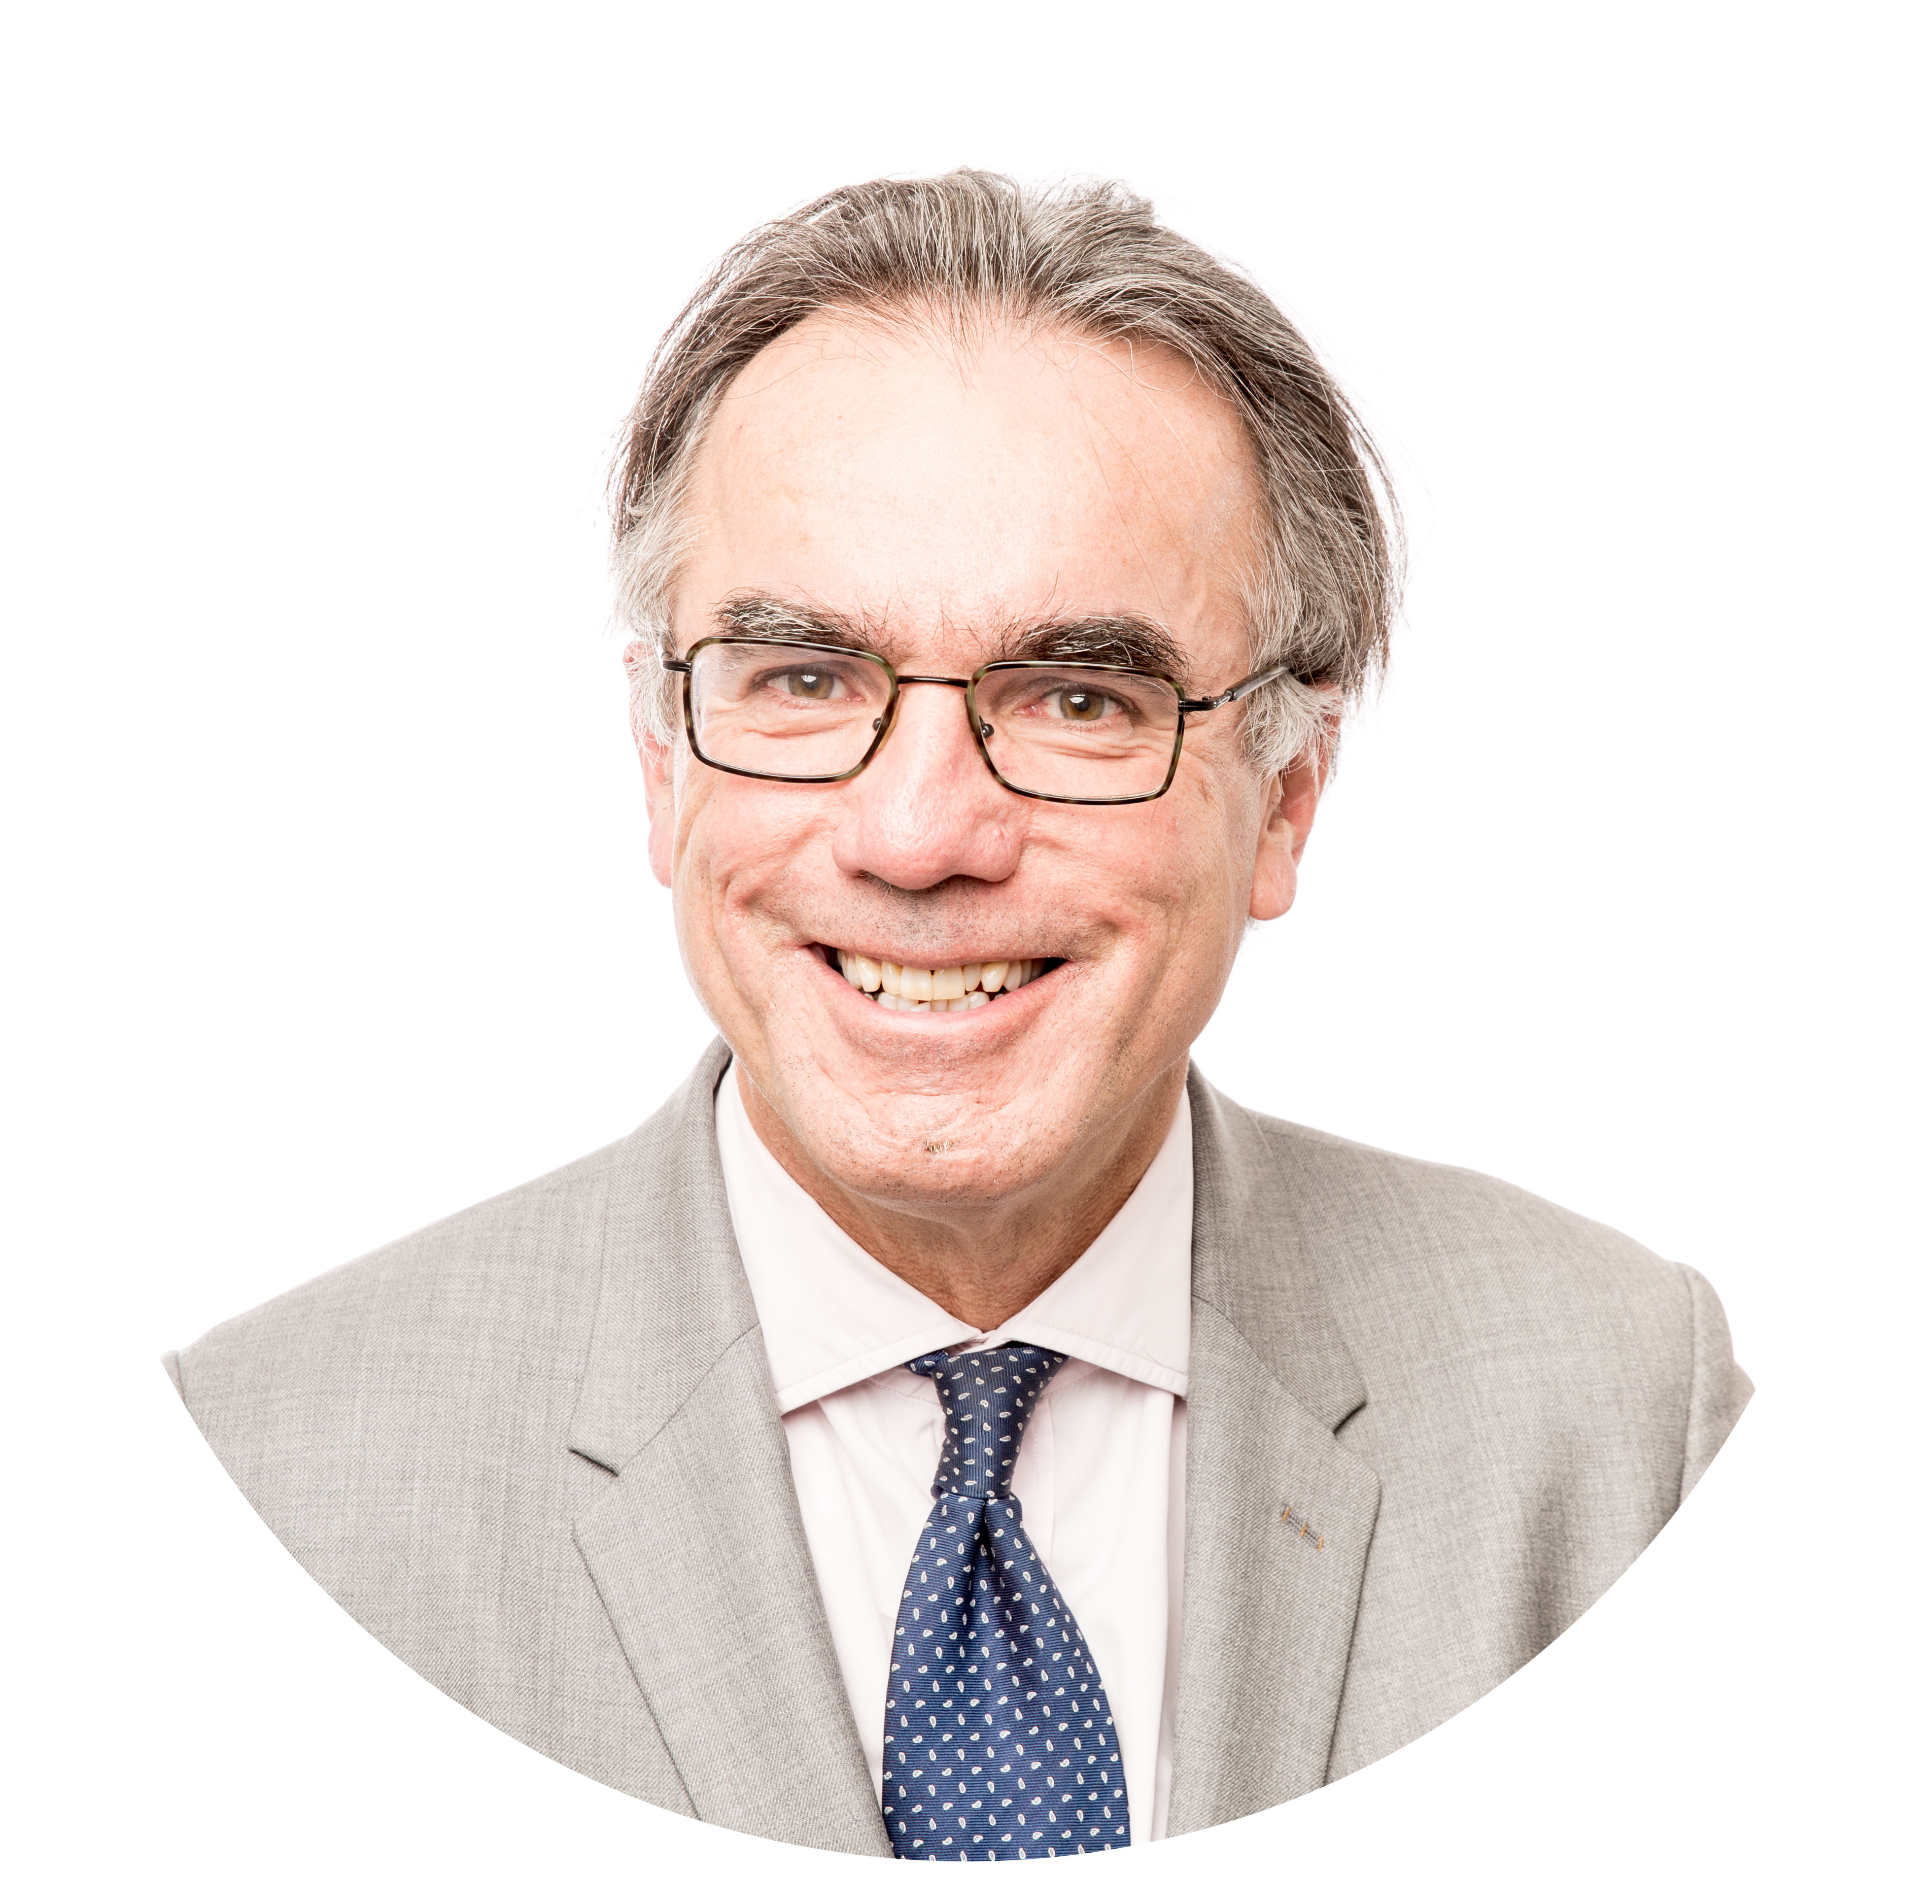 Paul McDonald, CEO Anglicare